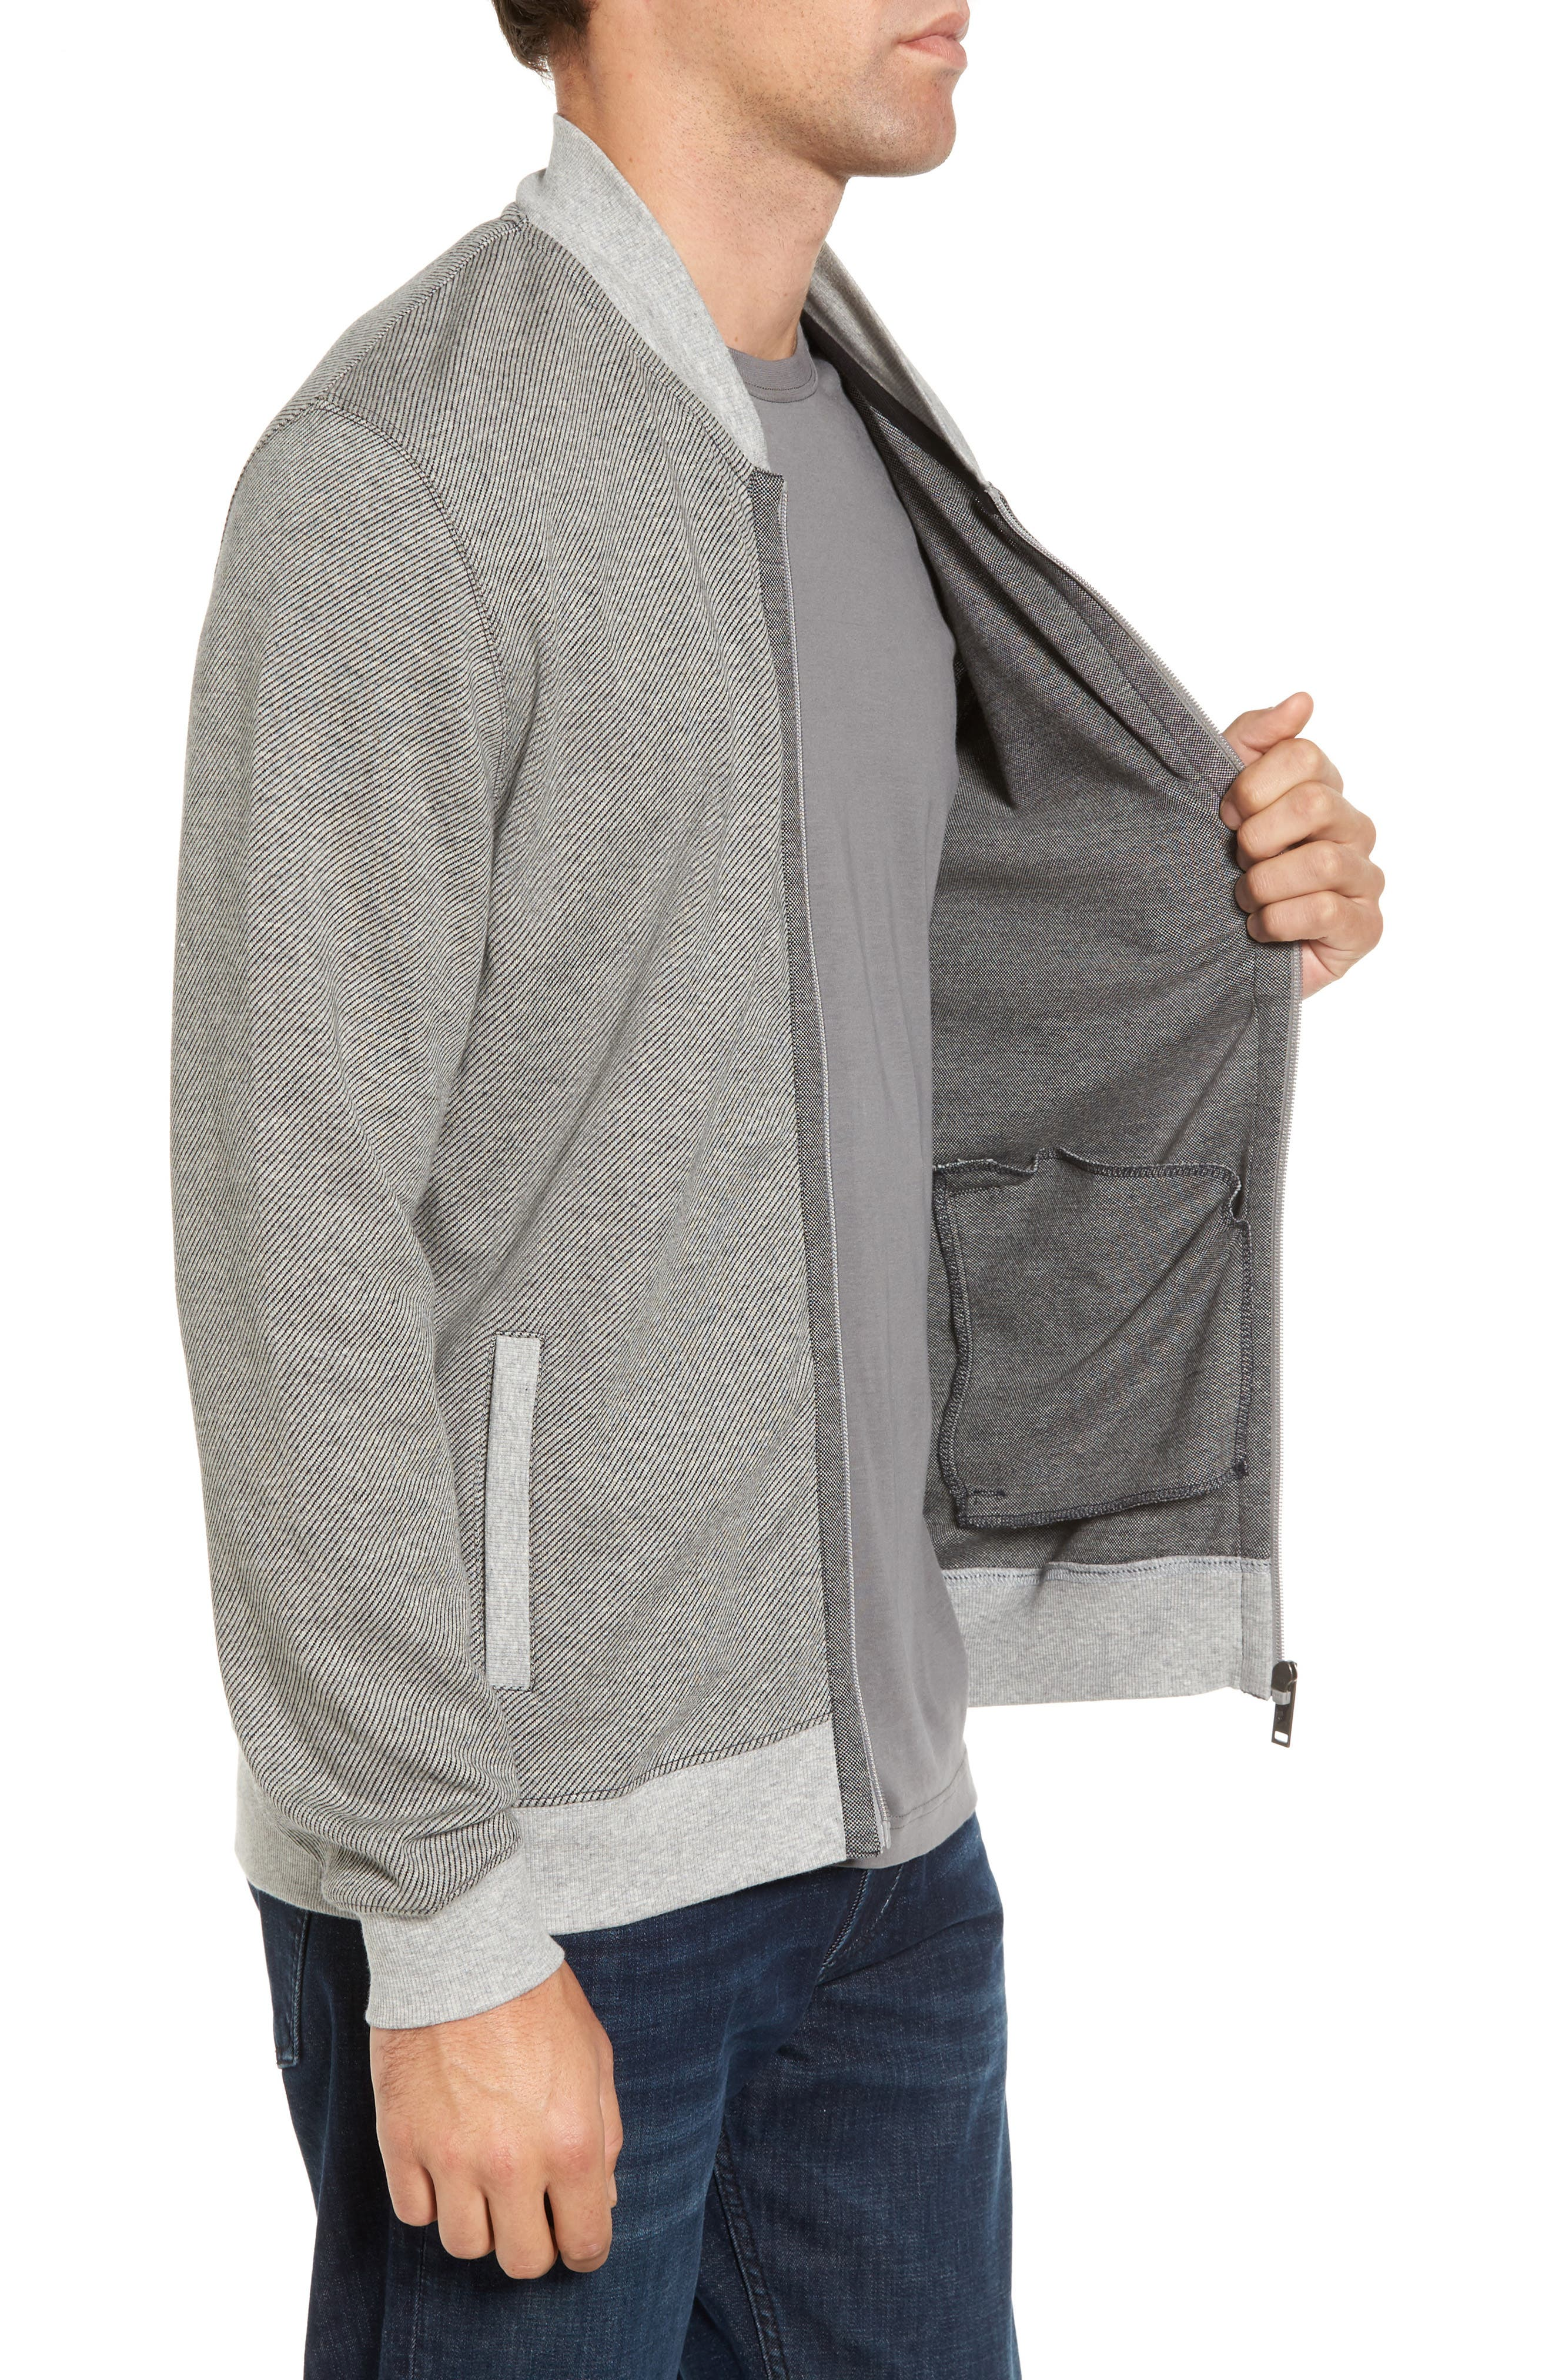 Alderson Ave Fleece Jacket,                             Alternate thumbnail 3, color,                             020